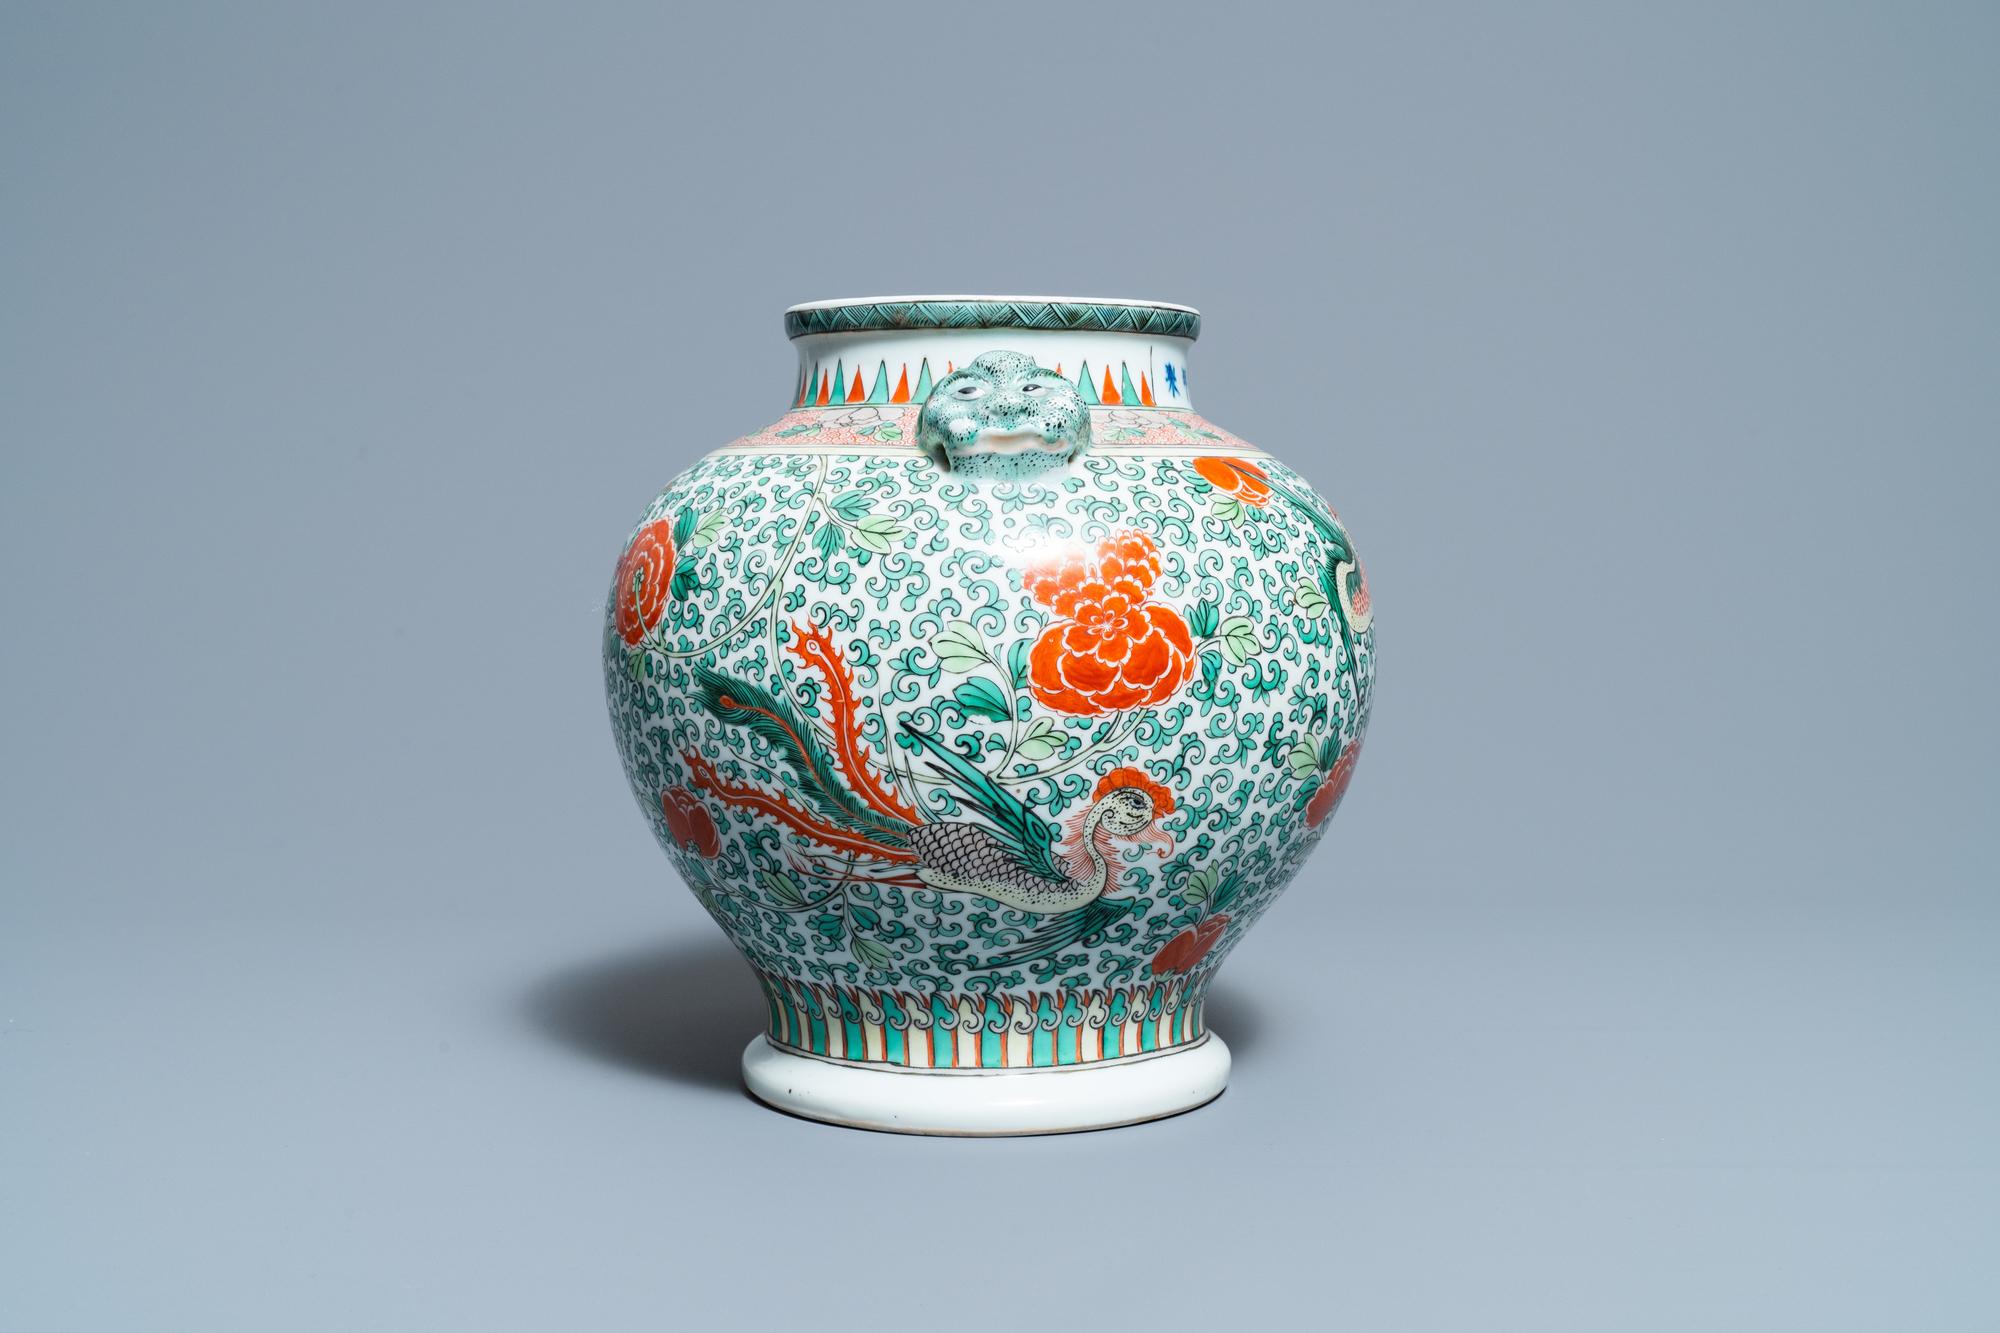 A Chinese 'wucai' phoenix vase, Chenghua mark, 19th C. - Image 4 of 6